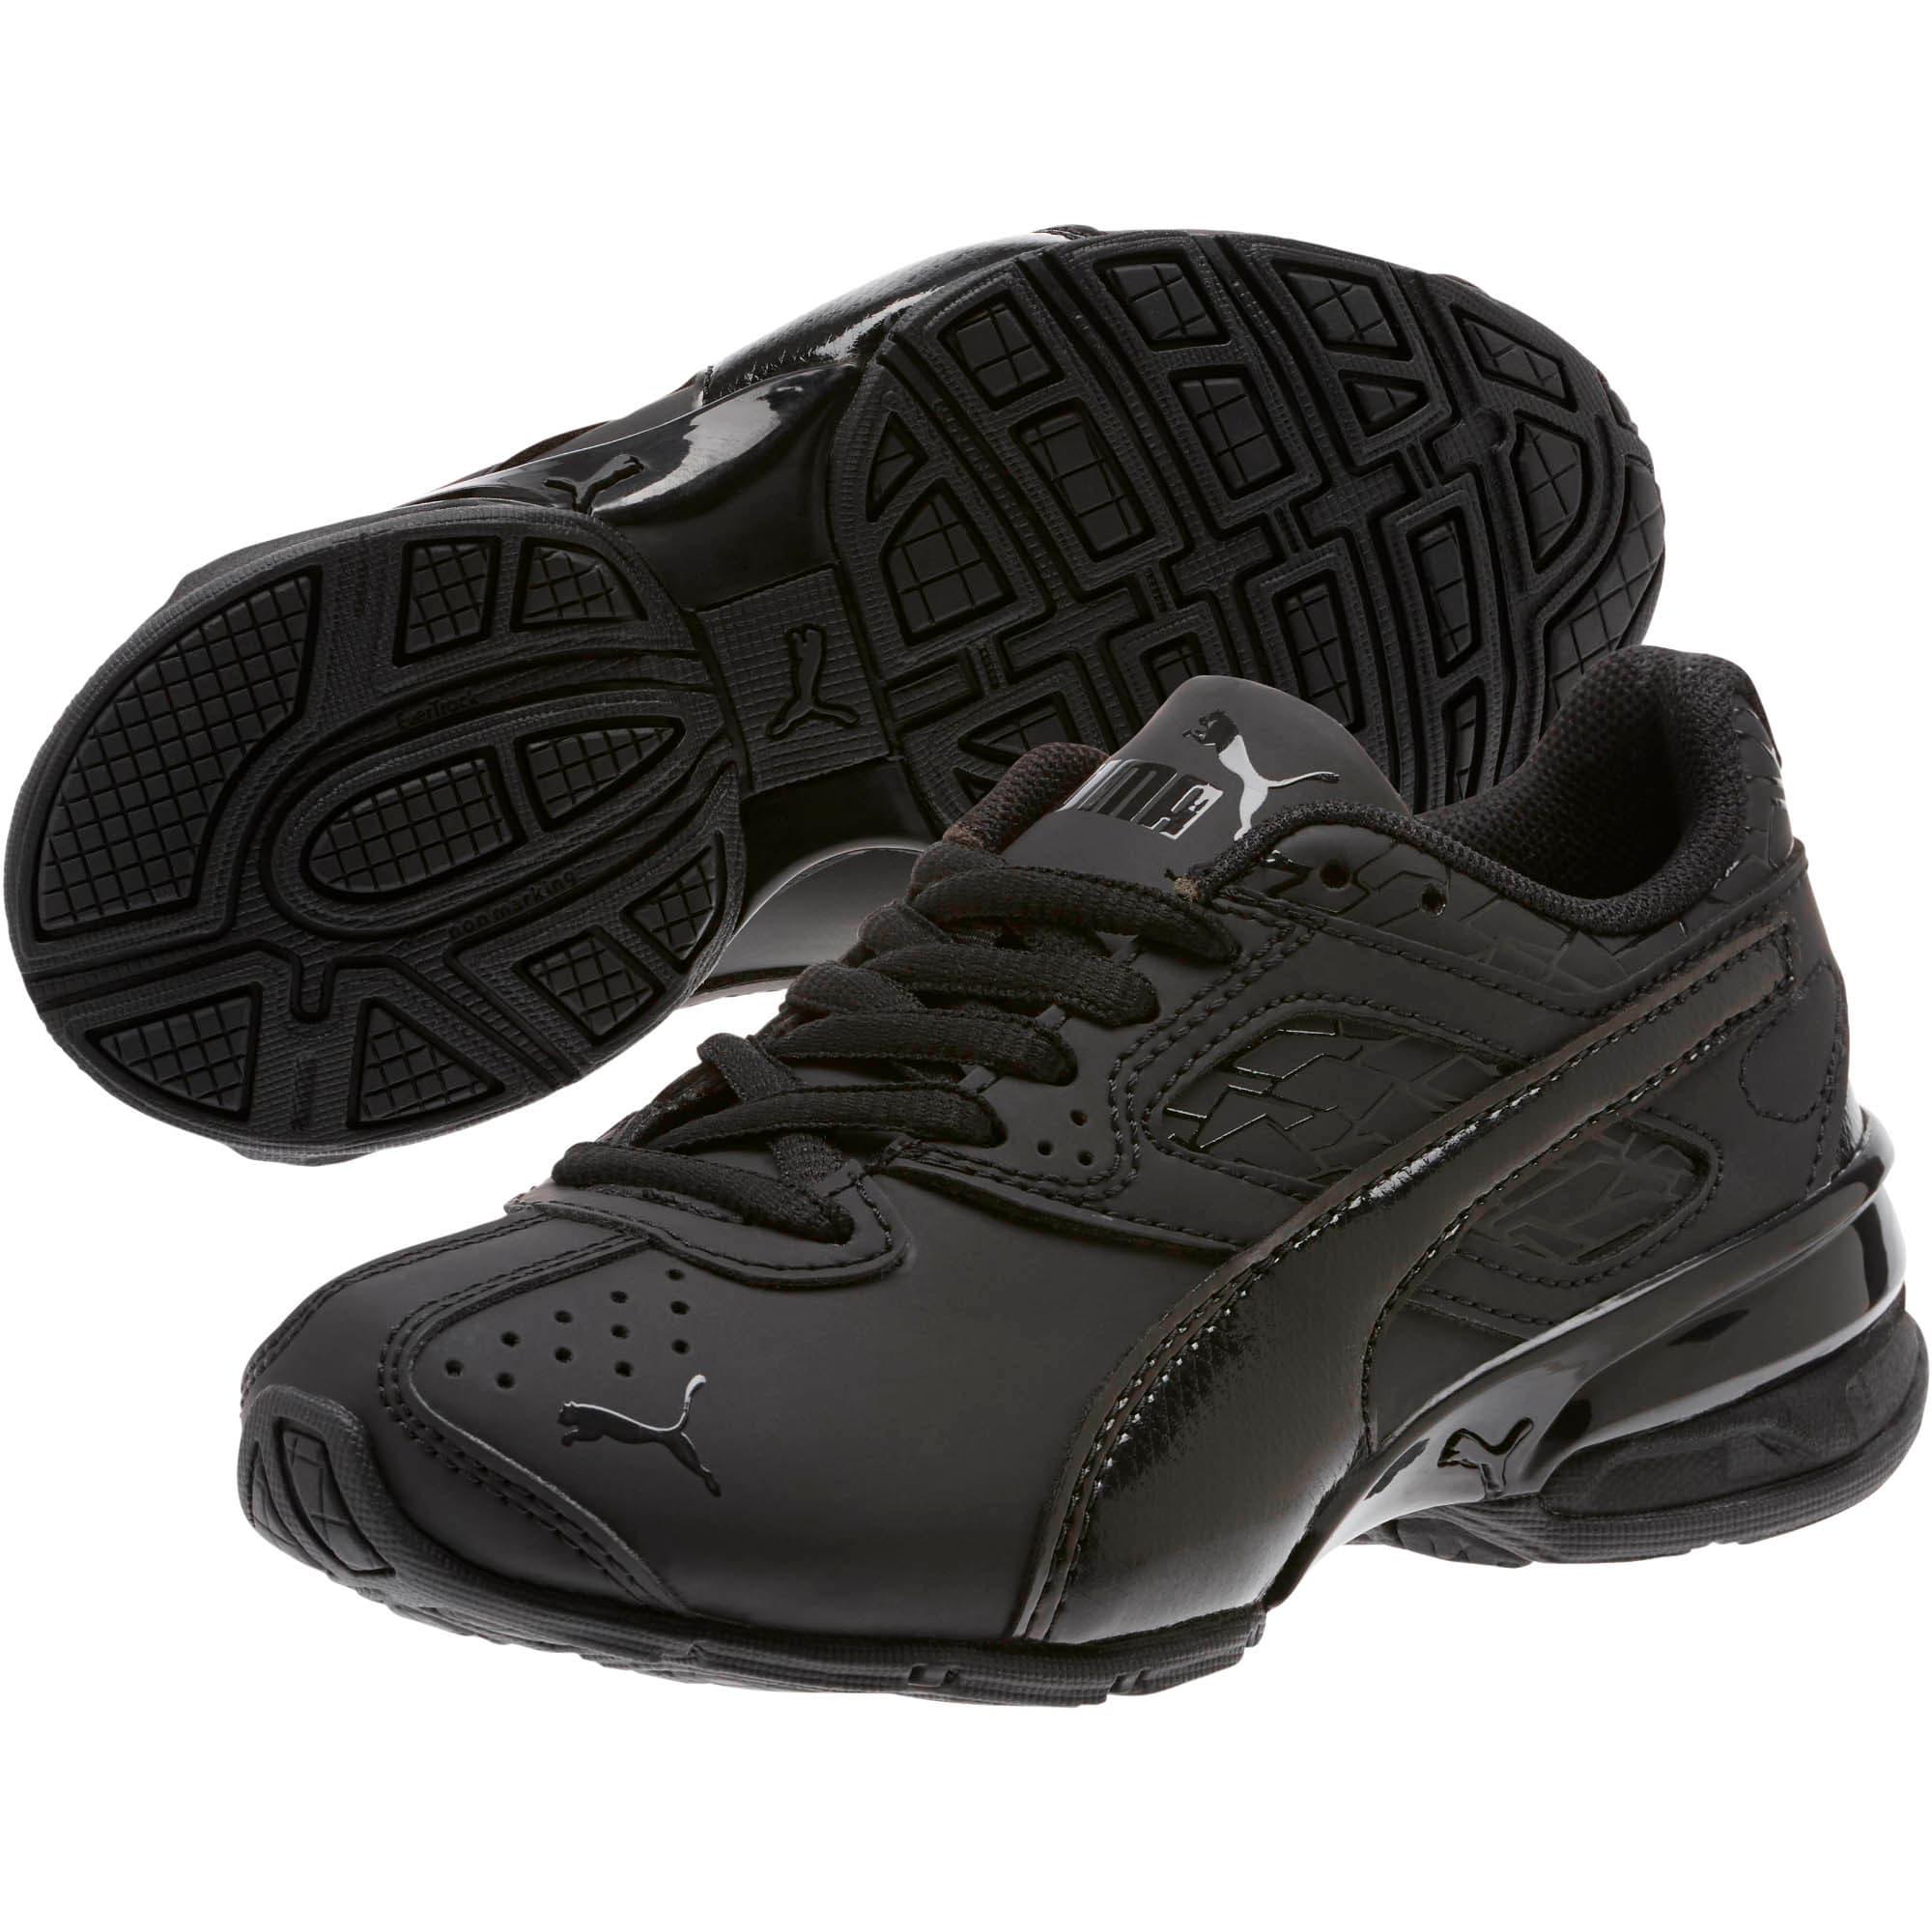 Thumbnail 2 of Tazon 6 Fracture AC Little Kids' Shoes, Puma Black, medium